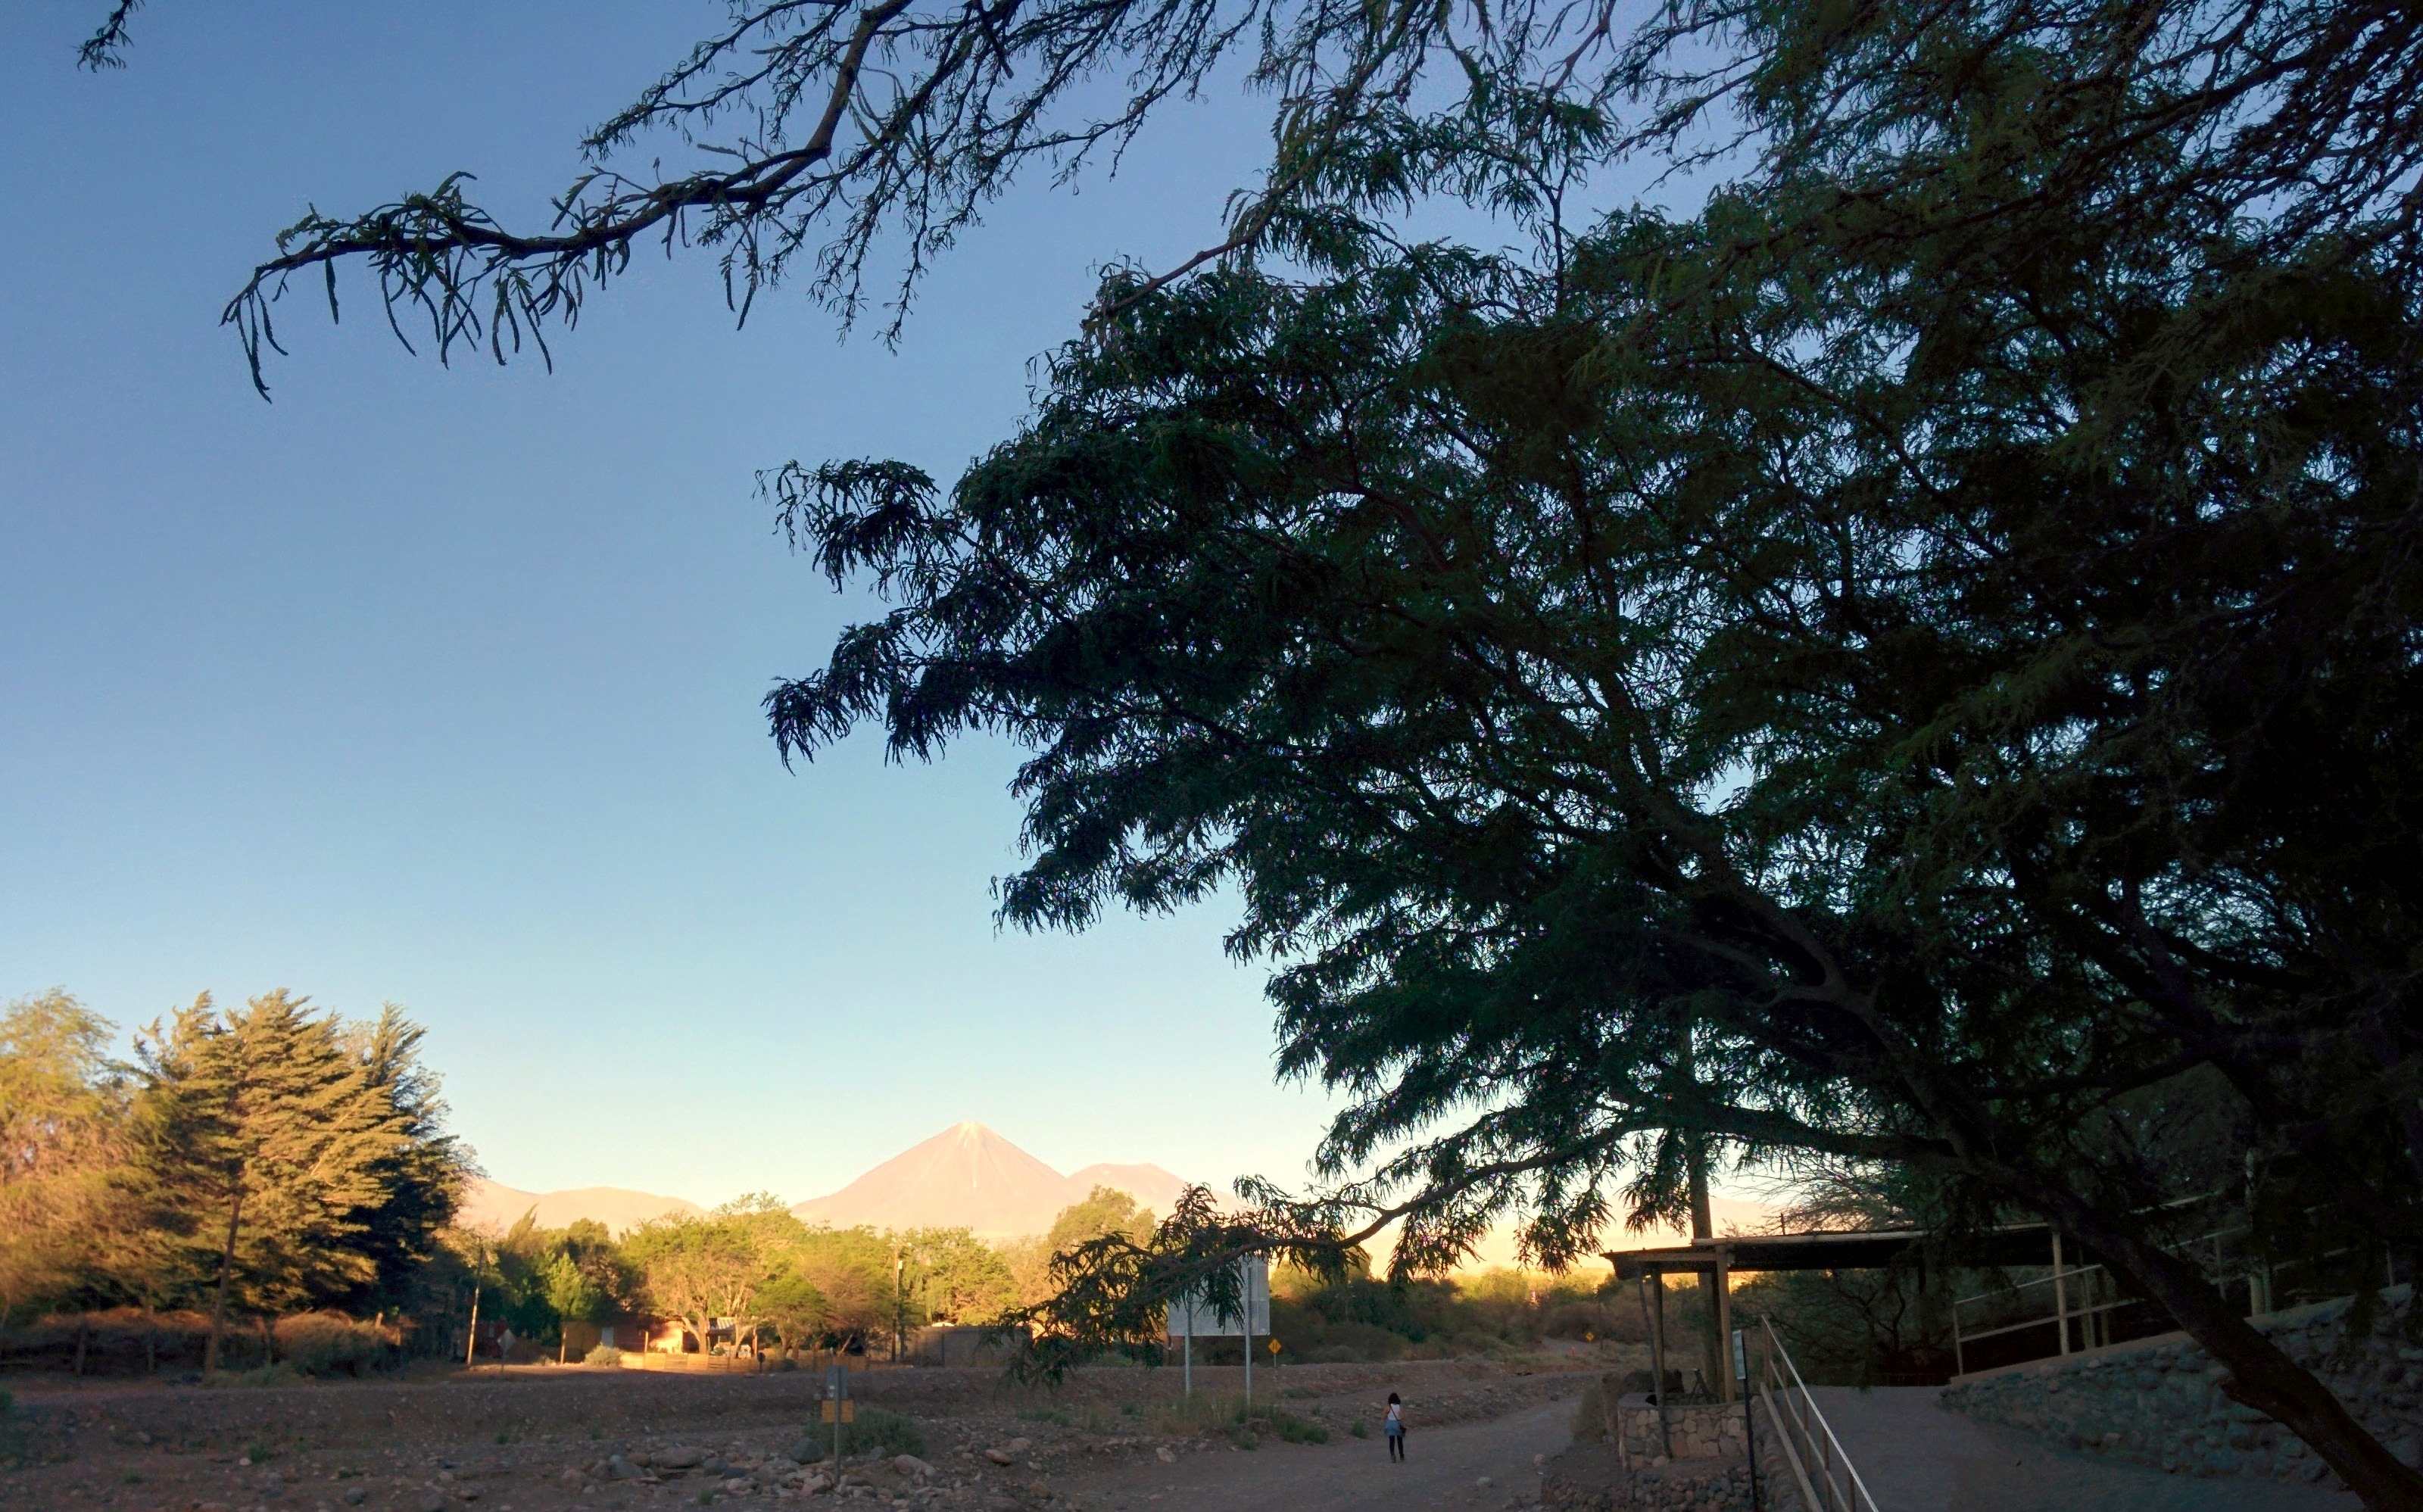 Arredores de San pedro de Atacama